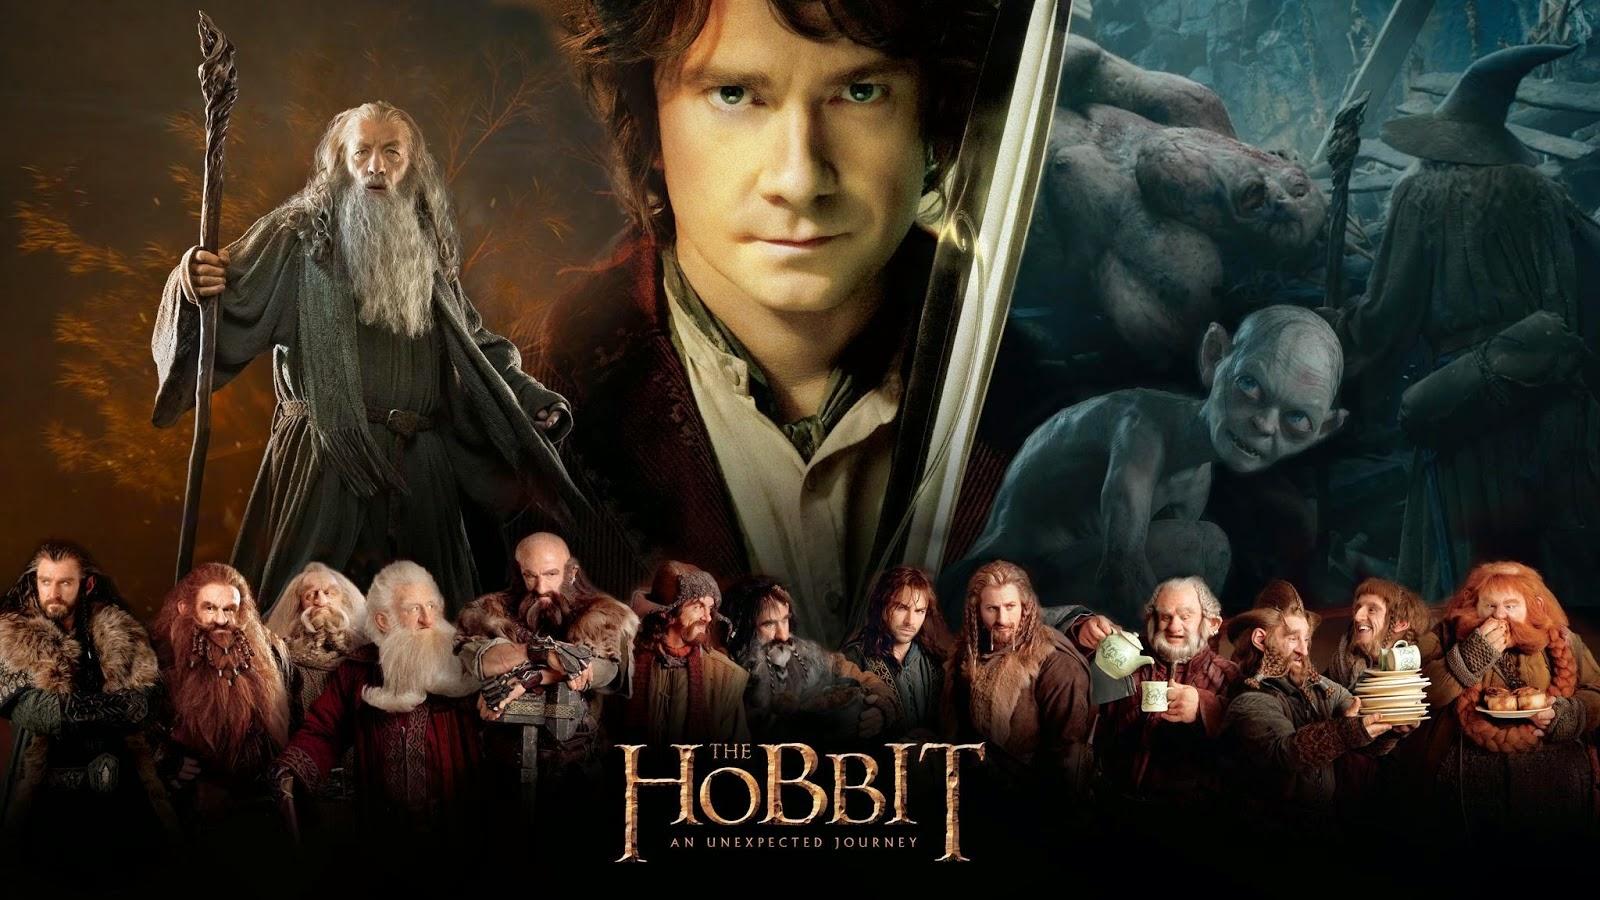 http://abanicodelibros.blogspot.com.es/2014/04/resena-de-cine-9-el-hobbit-un-viaje.html